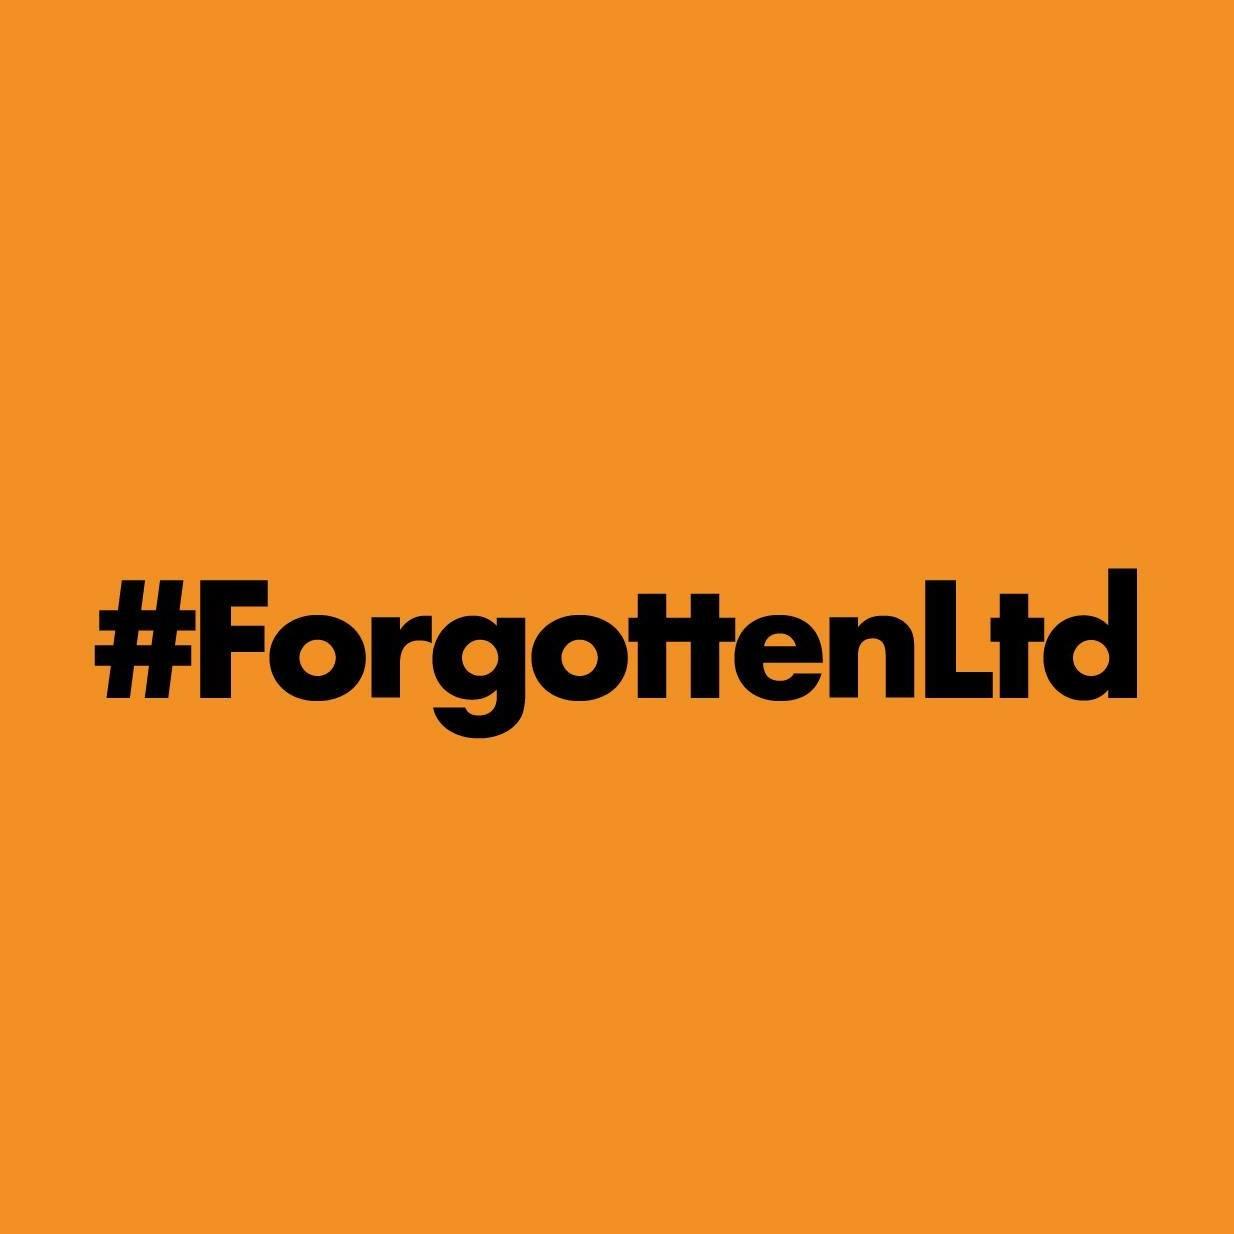 The ForgottenLtd